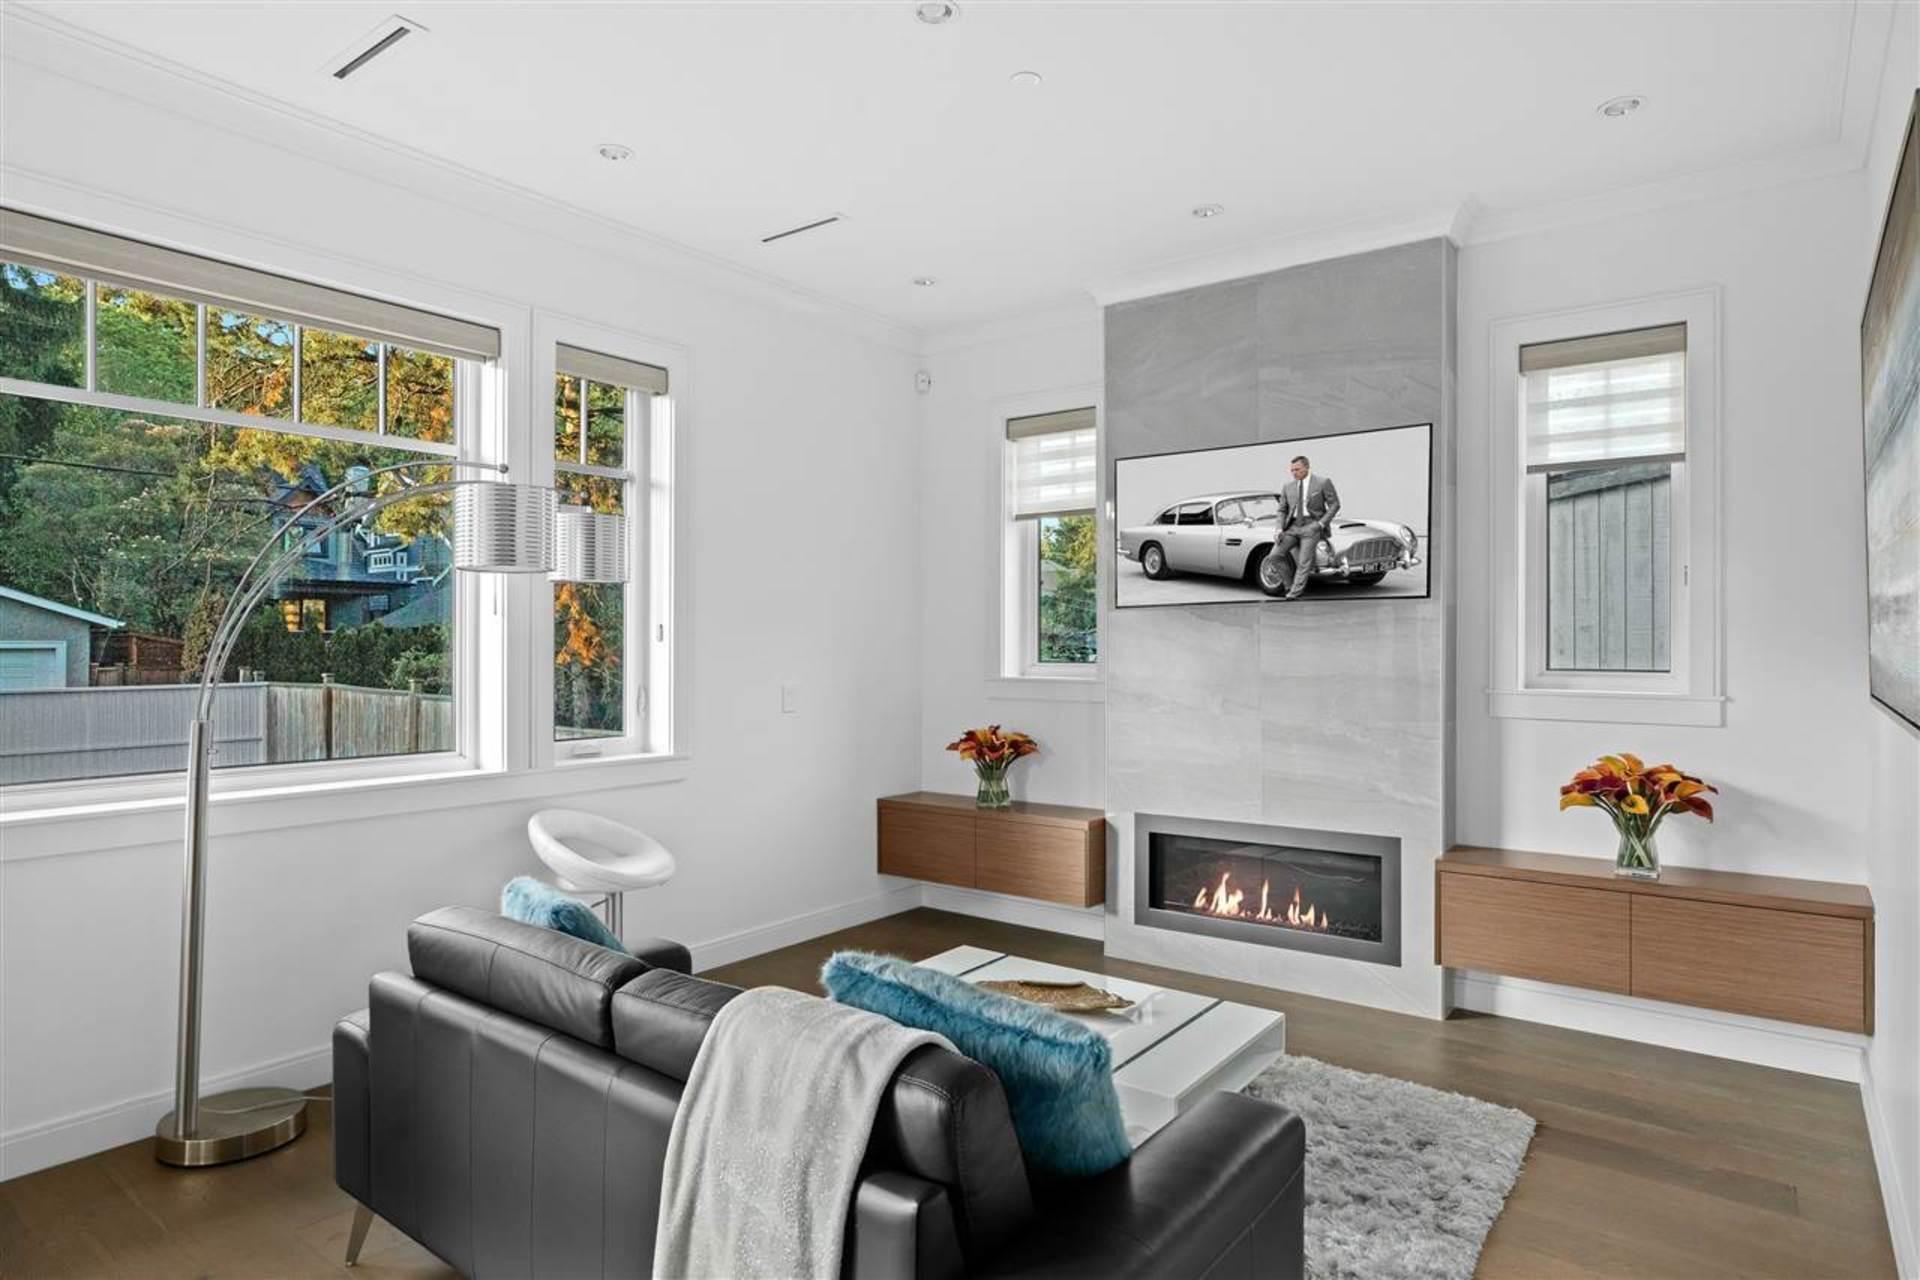 3707-w-37th-avenue-dunbar-vancouver-west-13 at 3707 W 37th Avenue, Dunbar, Vancouver West